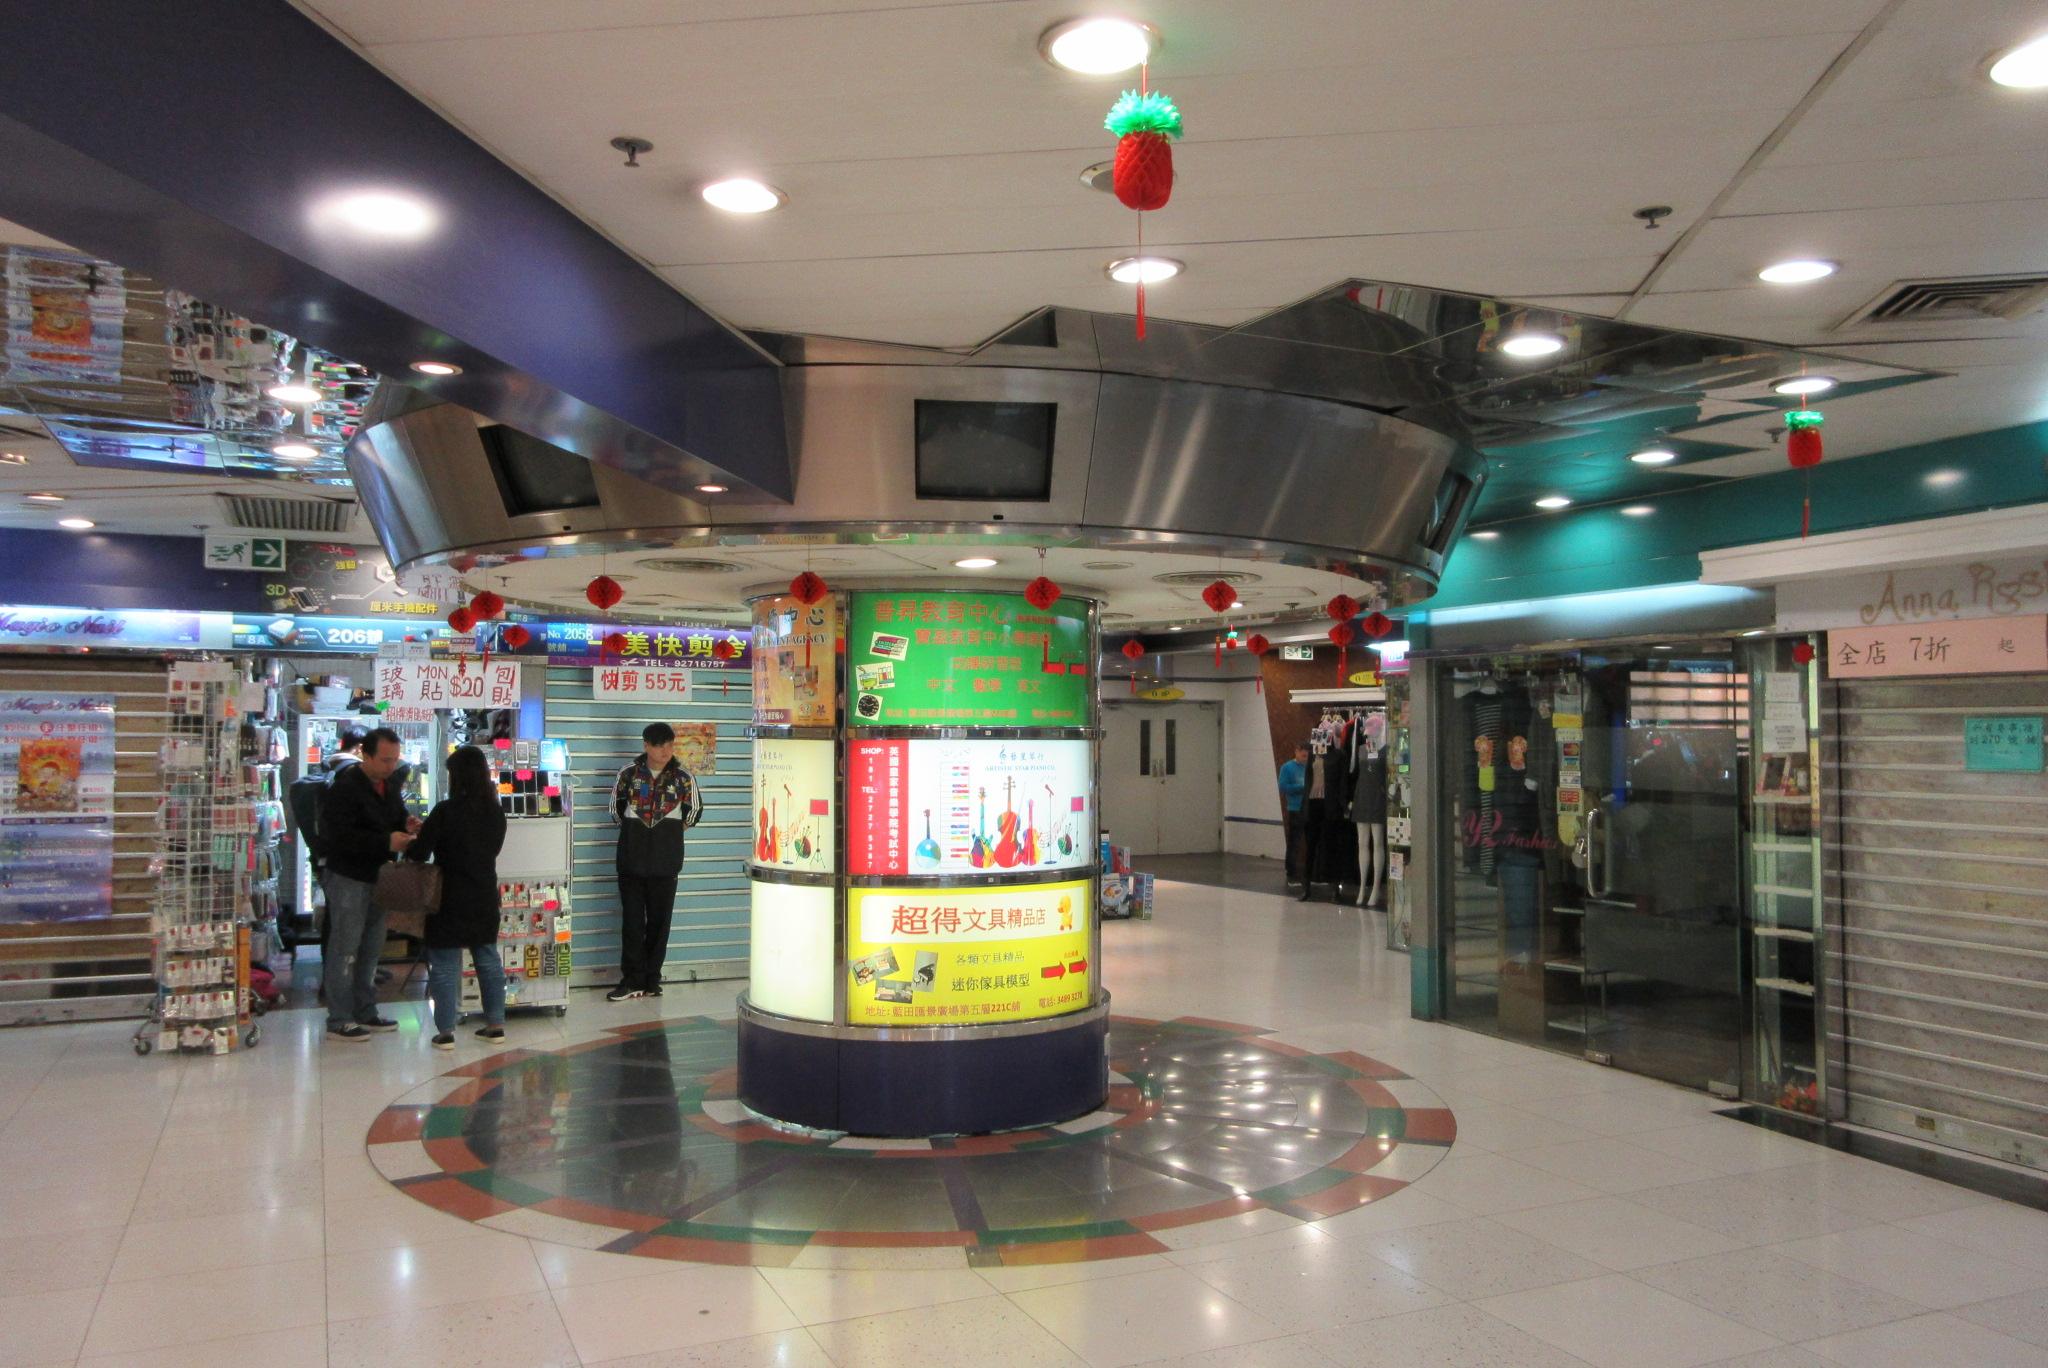 File:HK Lam Tin 藍田 匯景廣場 Sceneway Plaza mall interior shop number sign Jan 2017 IX1 04.jpg - Wikimedia Commons